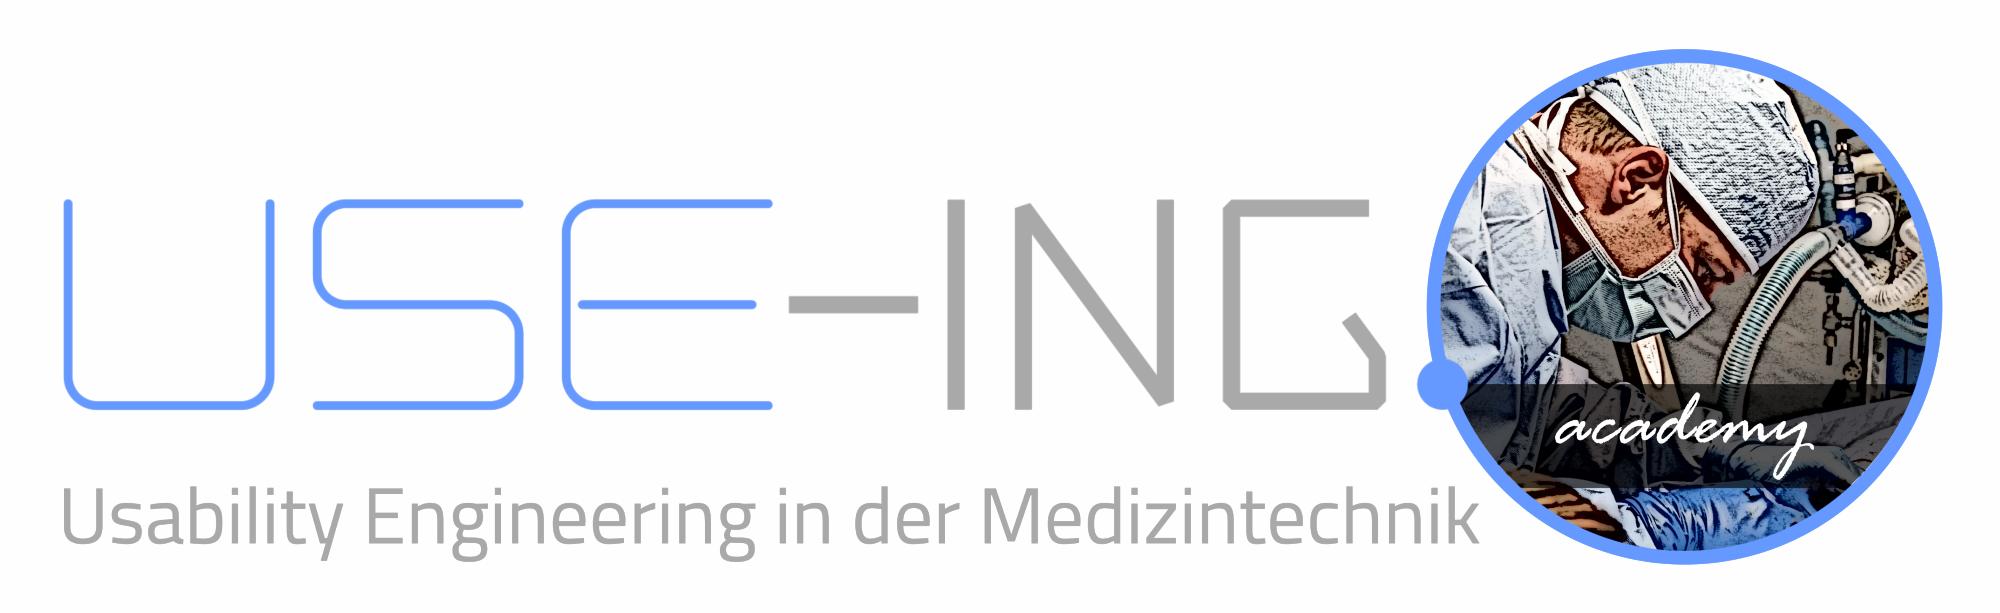 Online-Seminar: Usability Engineering in der Medizintechnik